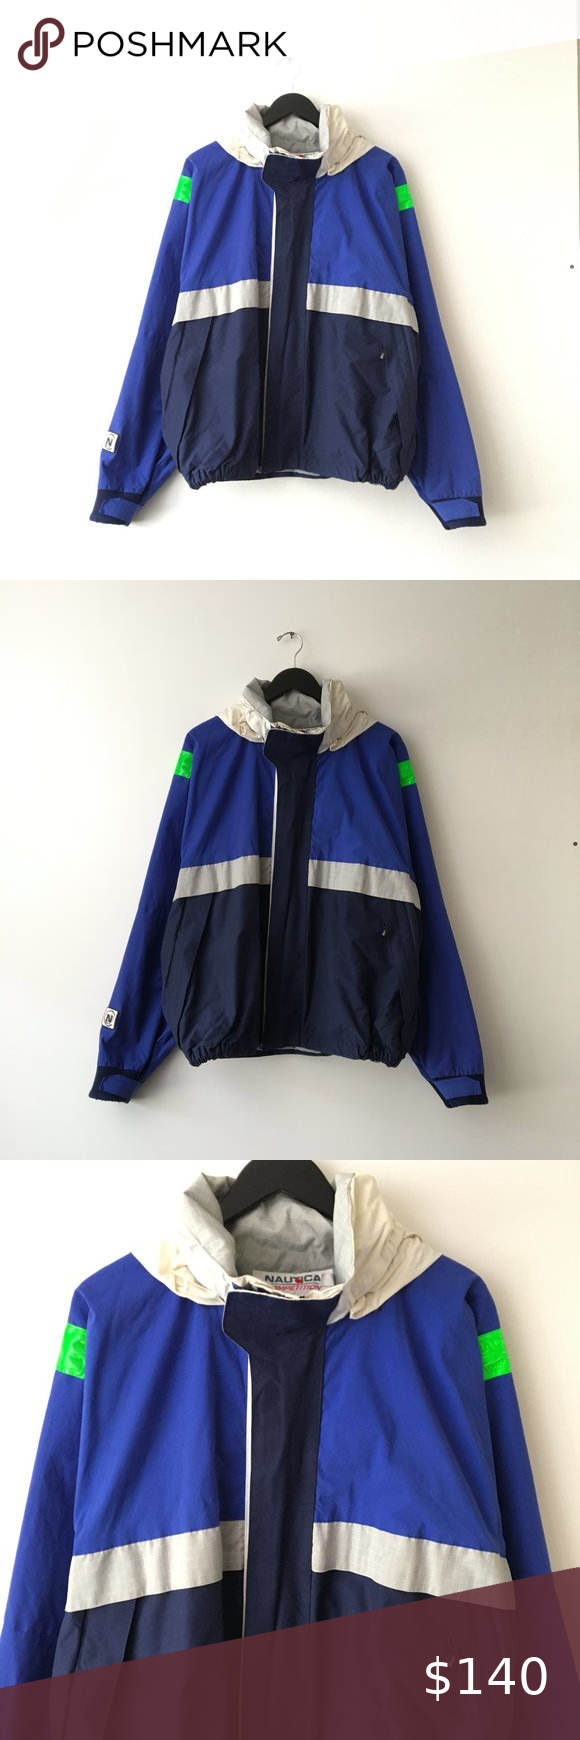 90s Vintage Nautica Competition Jacket Coat Xl In 2020 Color Block Jacket Jackets Coats Jackets